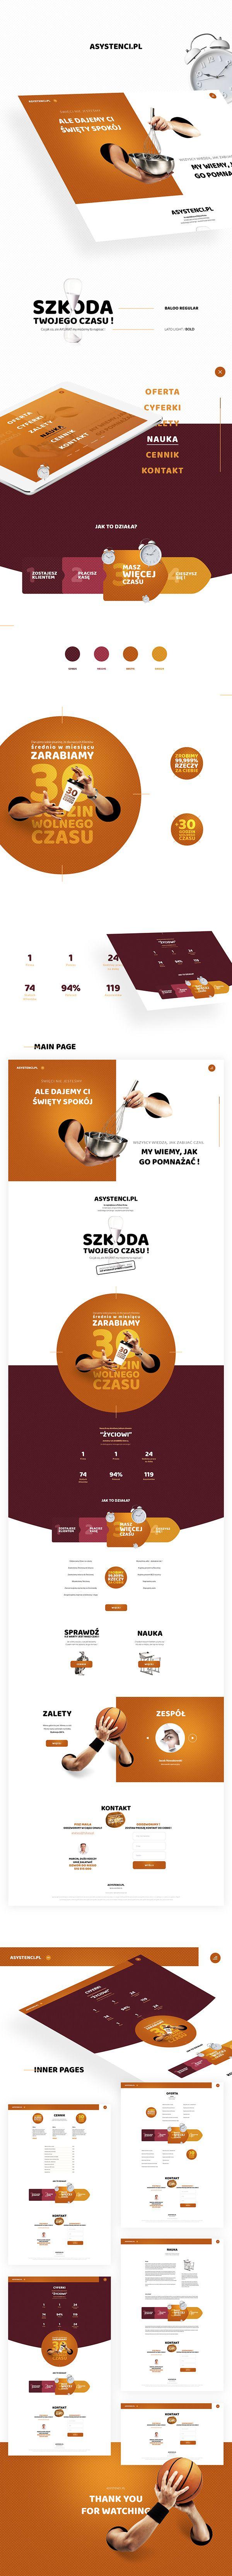 Web design iu inspiration. Website Asystenci. Igor Vensko.